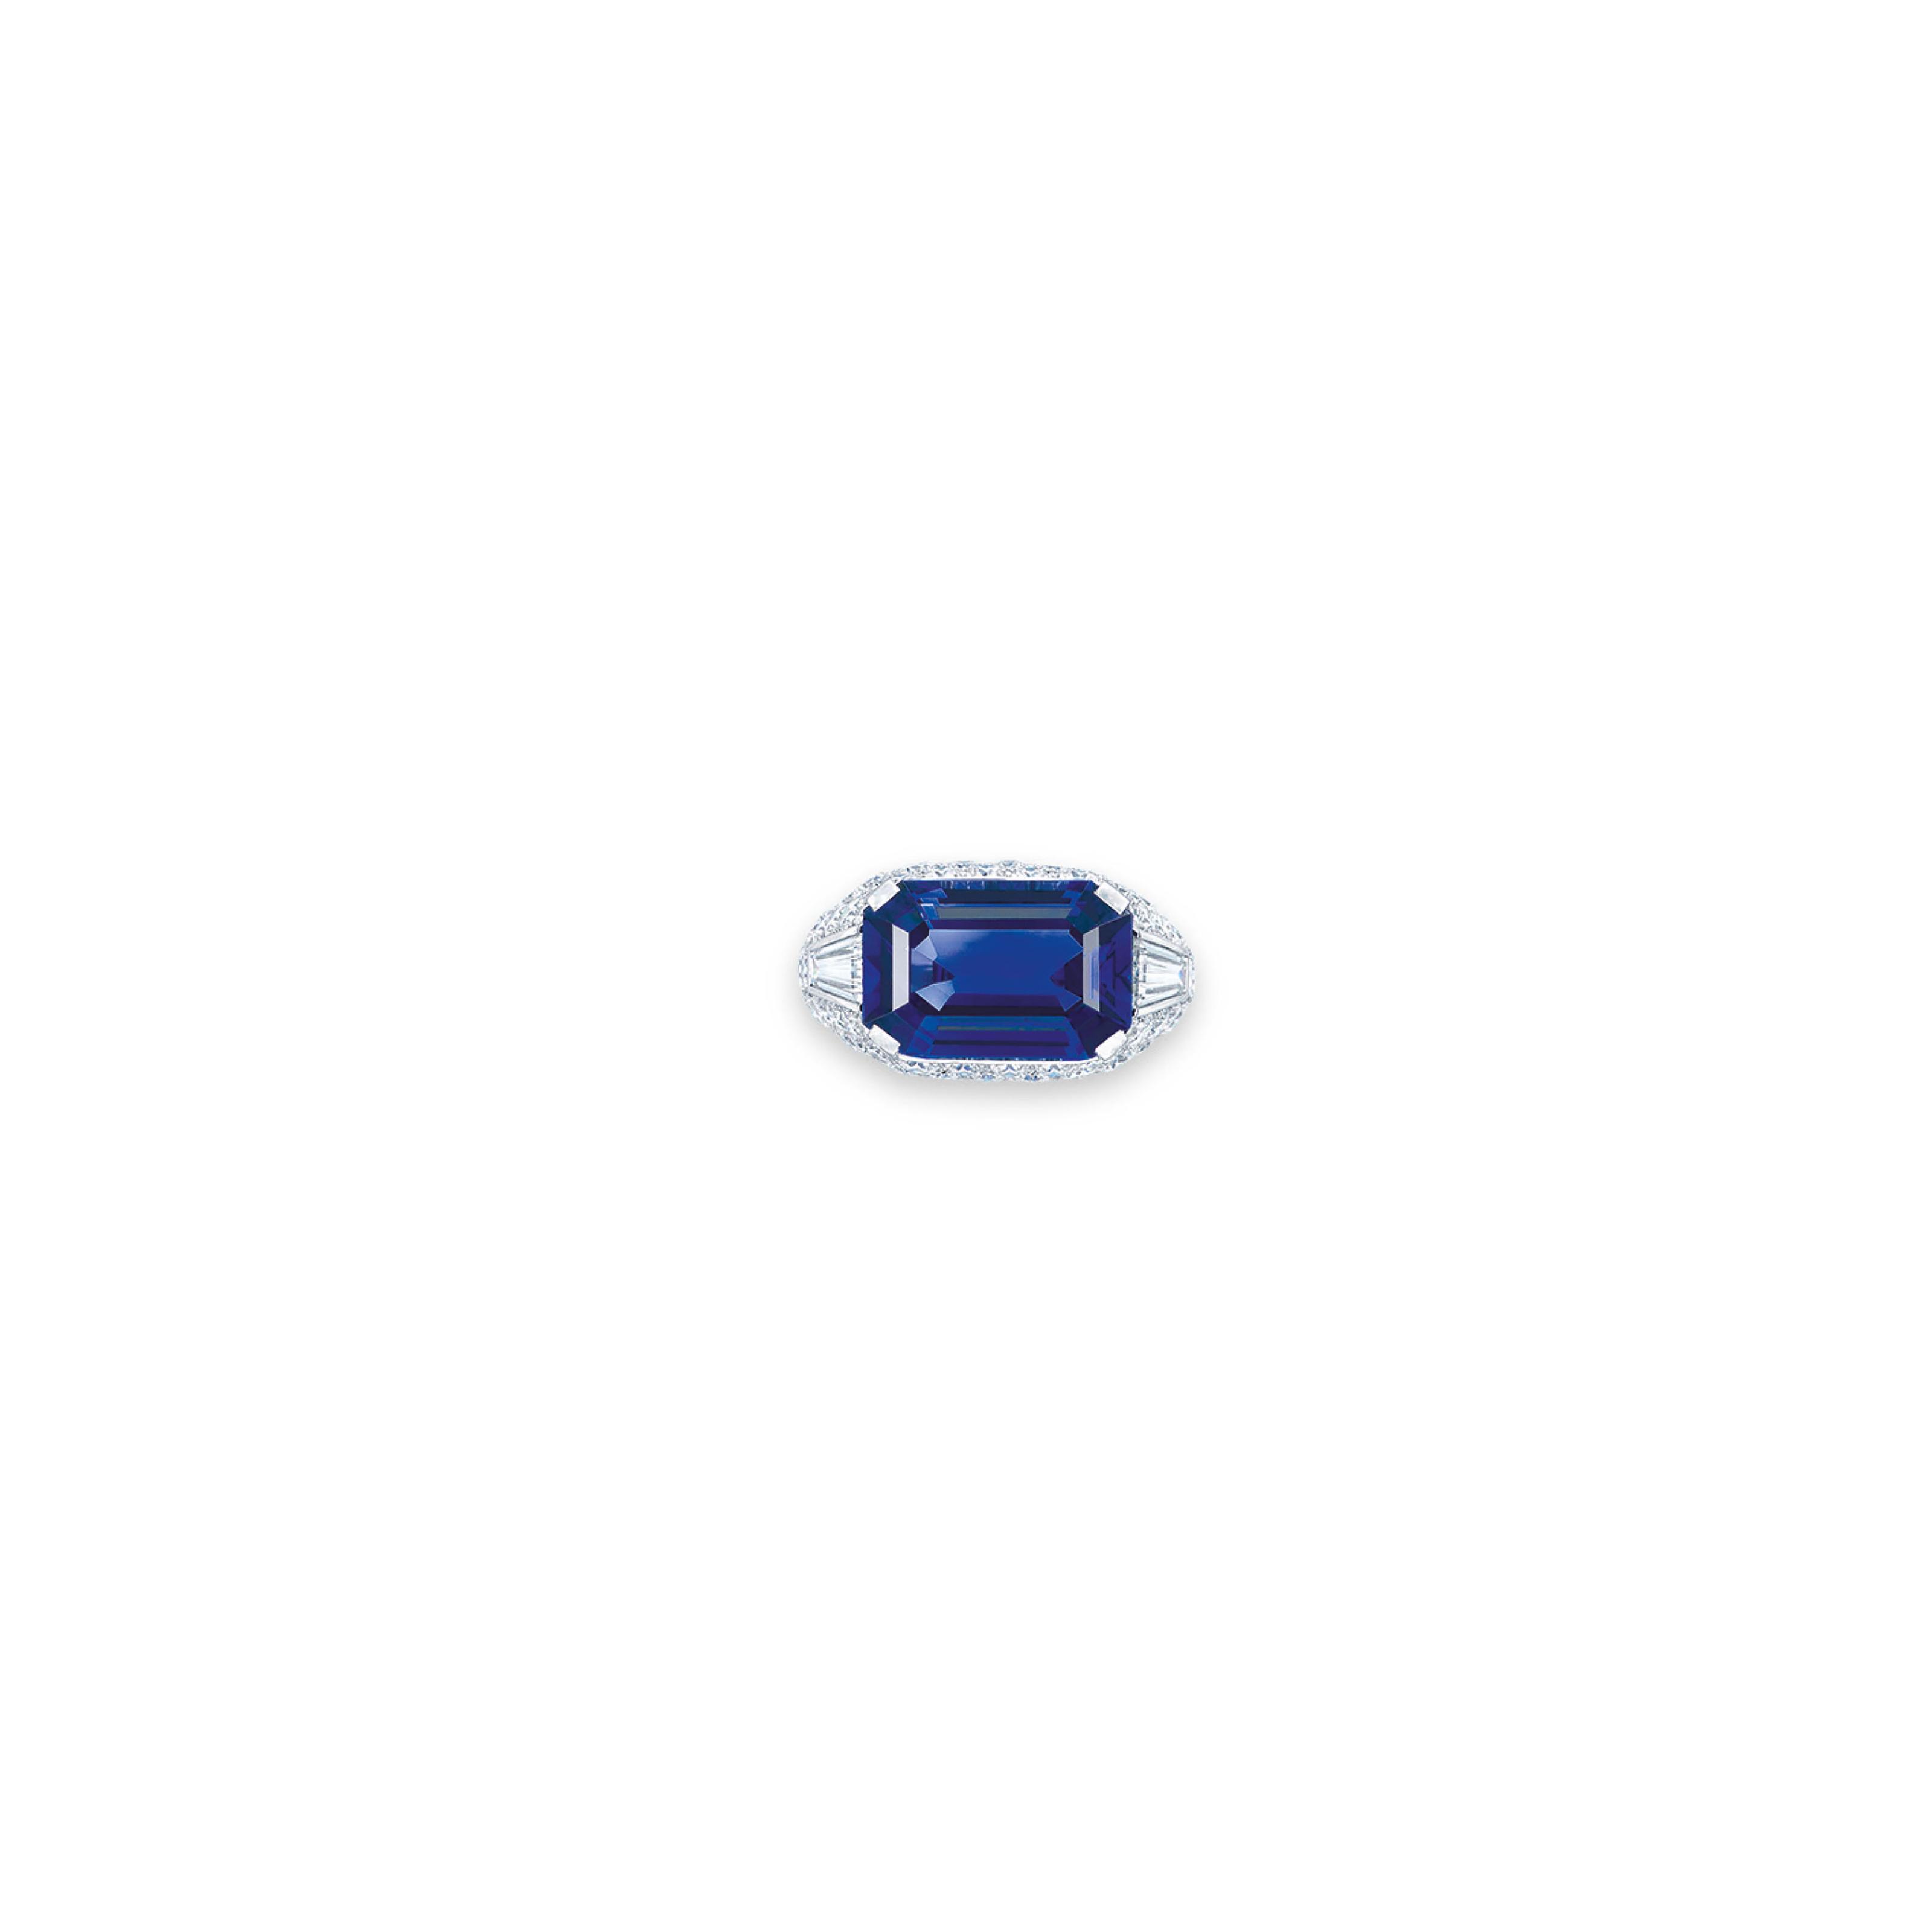 A SAPPHIRE AND DIAMOND RING, BY SUWA